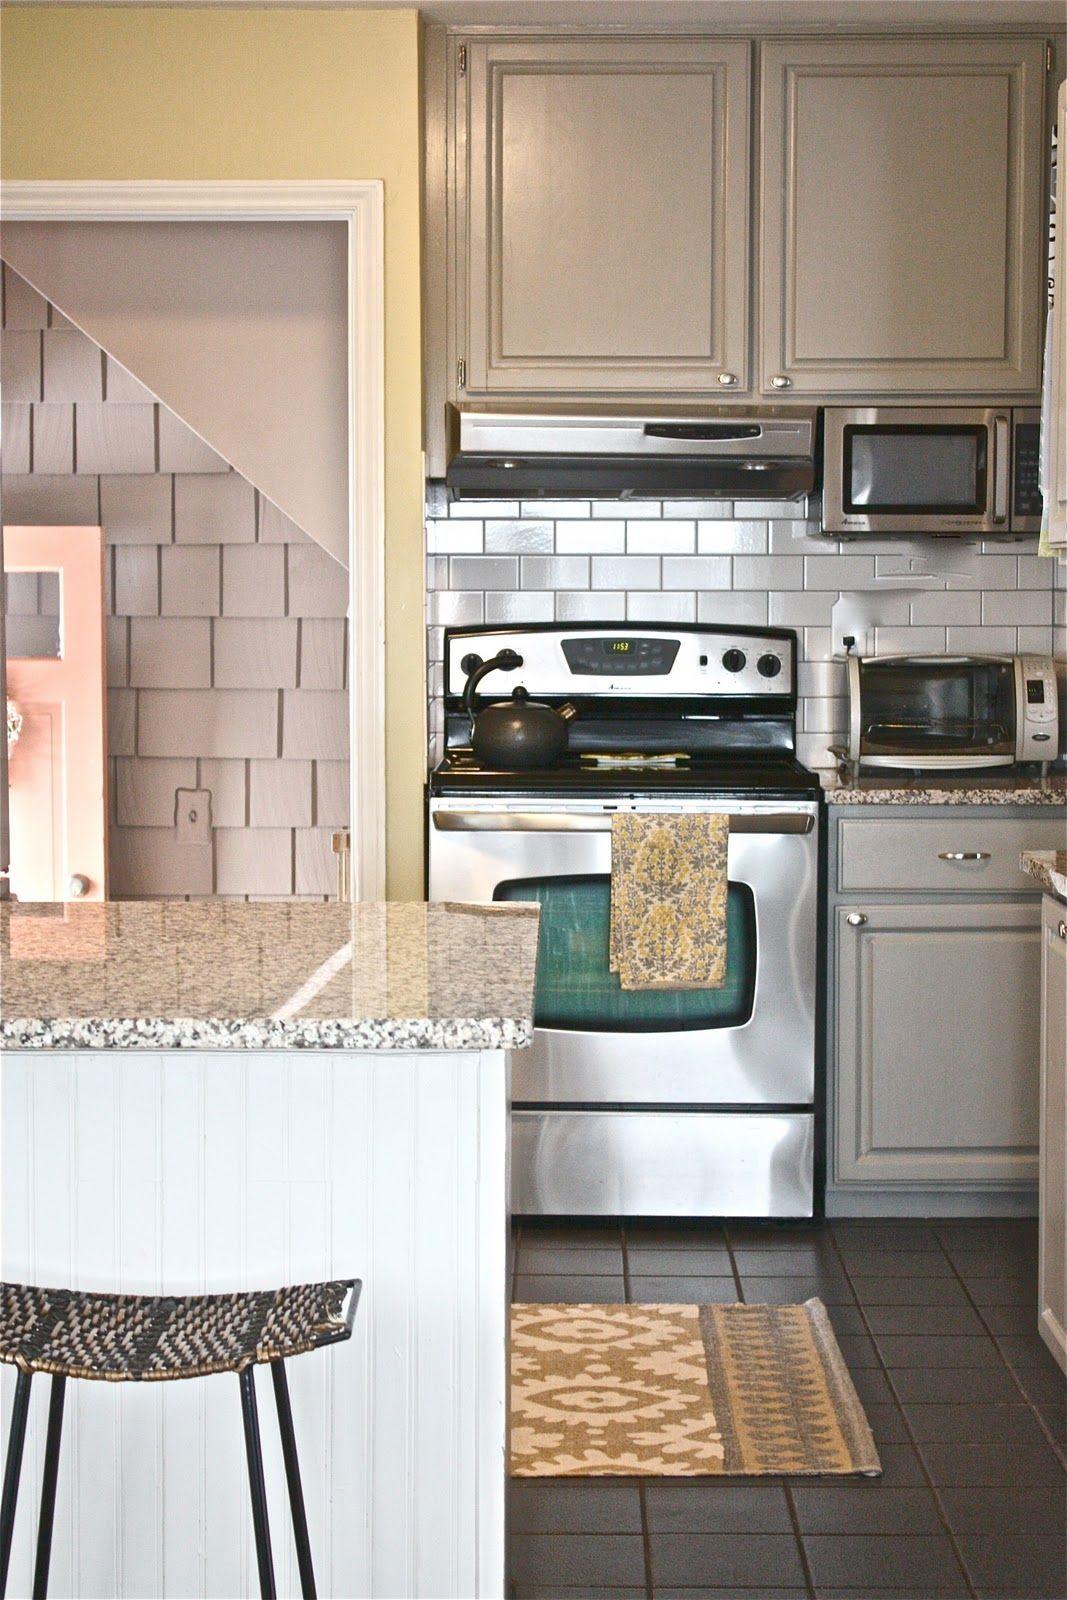 astonishing yellow kitchen walls grey cabinets | Gray cabinets, greenish-yellow walls, white subway tile ...